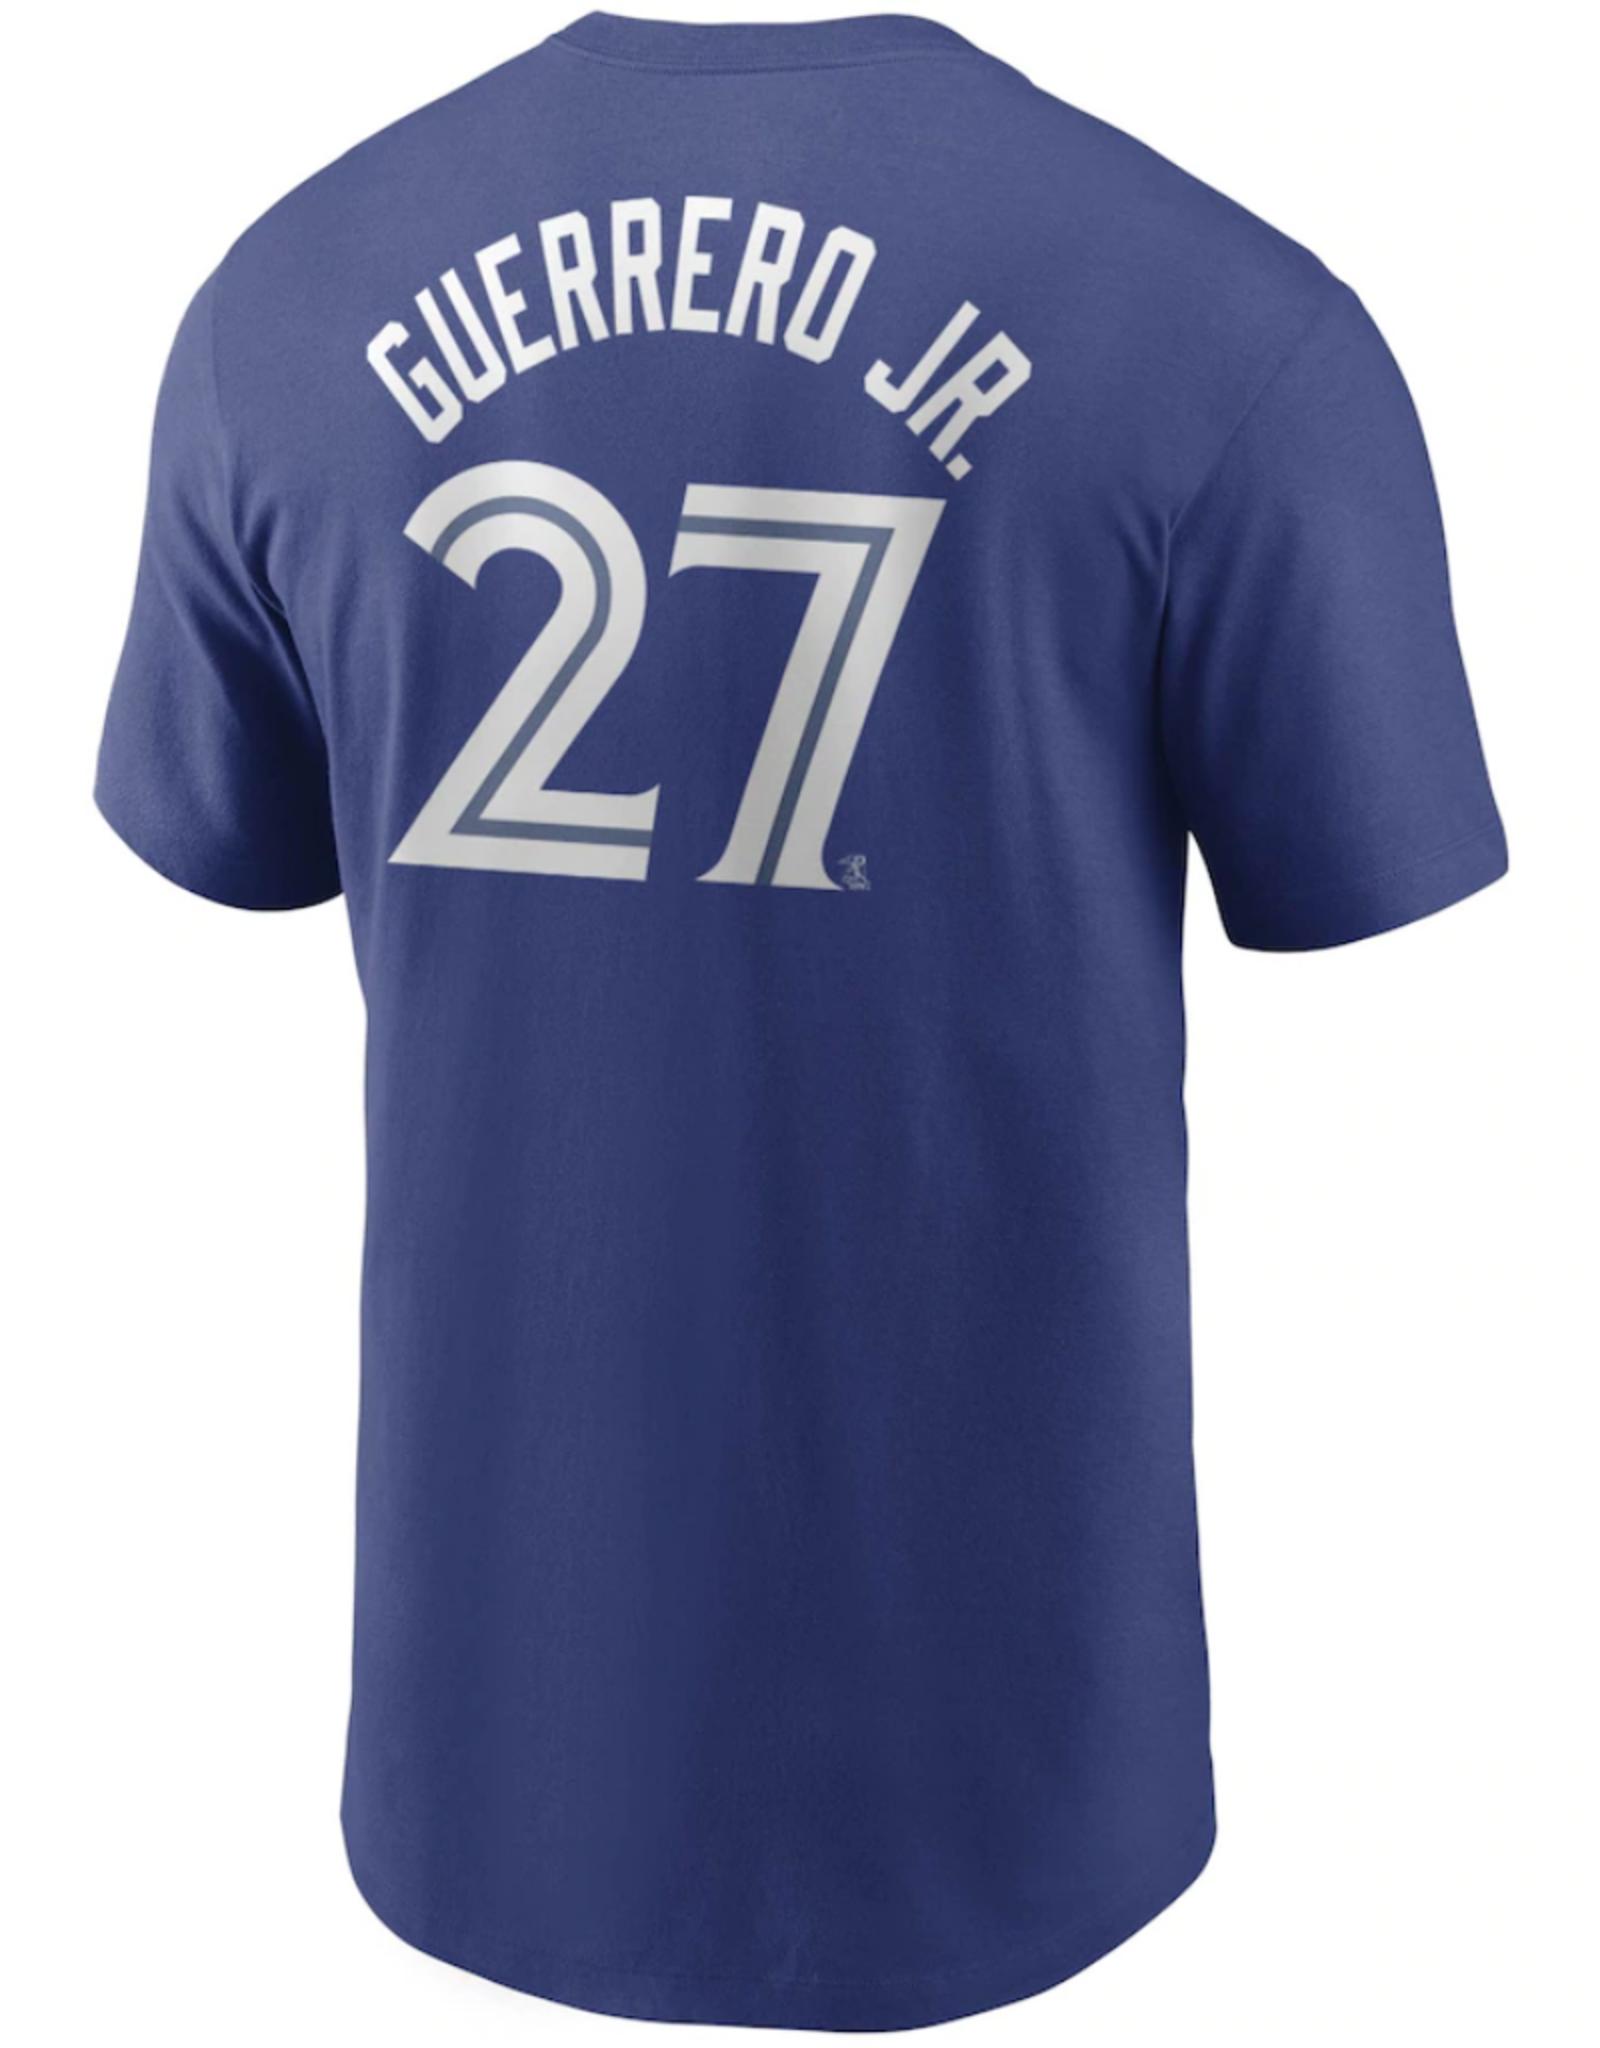 Nike Men's Player T-Shirt Guerrero #27 Toronto Blue Jays Royal